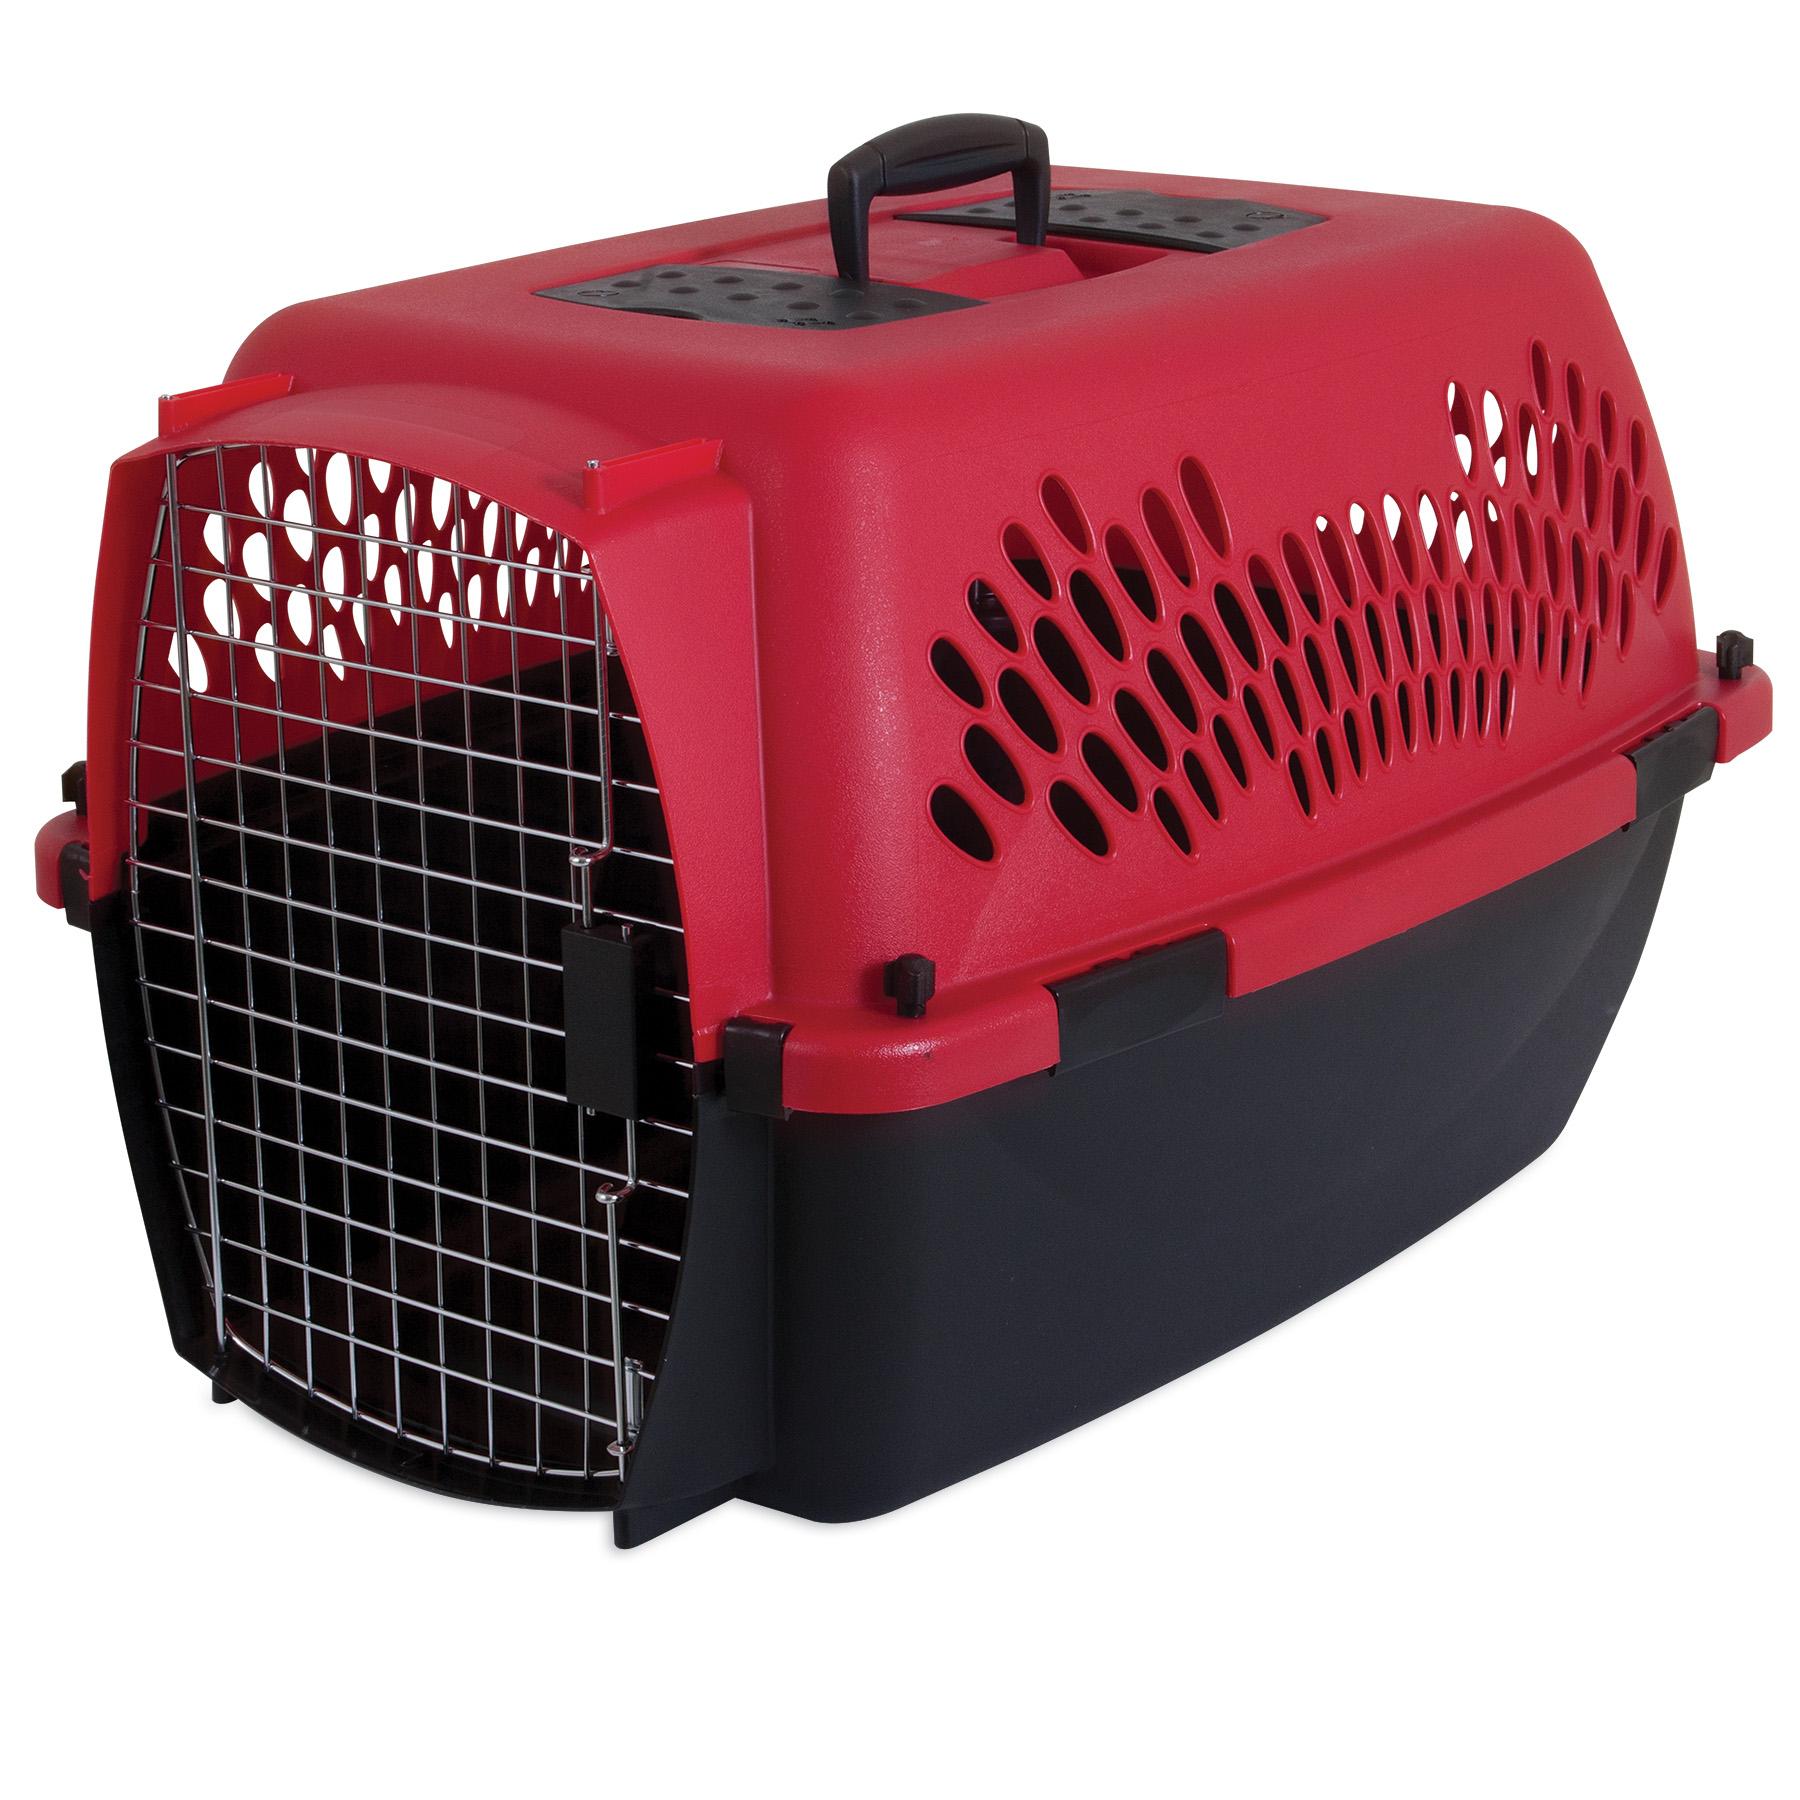 "Aspen Pet Pet Porter Fashion Kennel, 26"" 20-25Lbs"